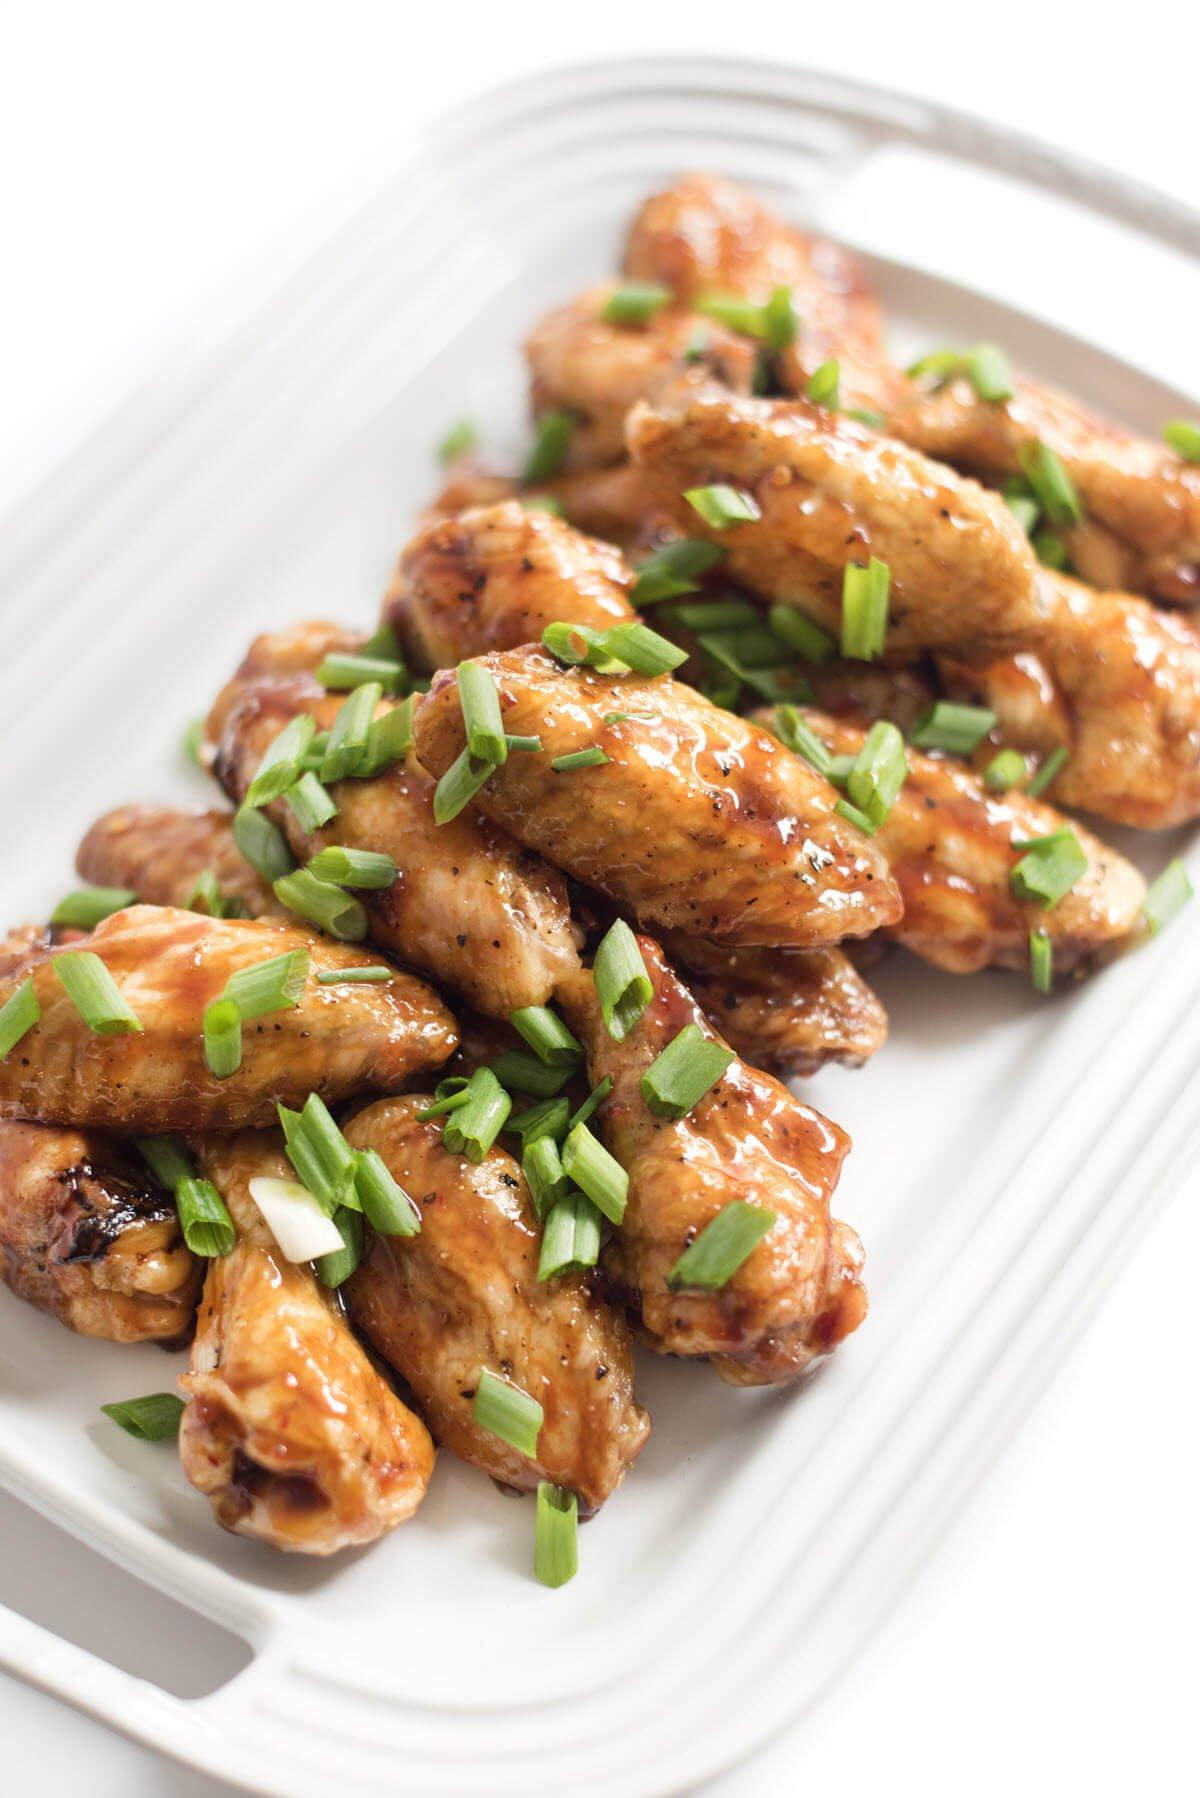 Baked Asian Glazed Chicken Wings